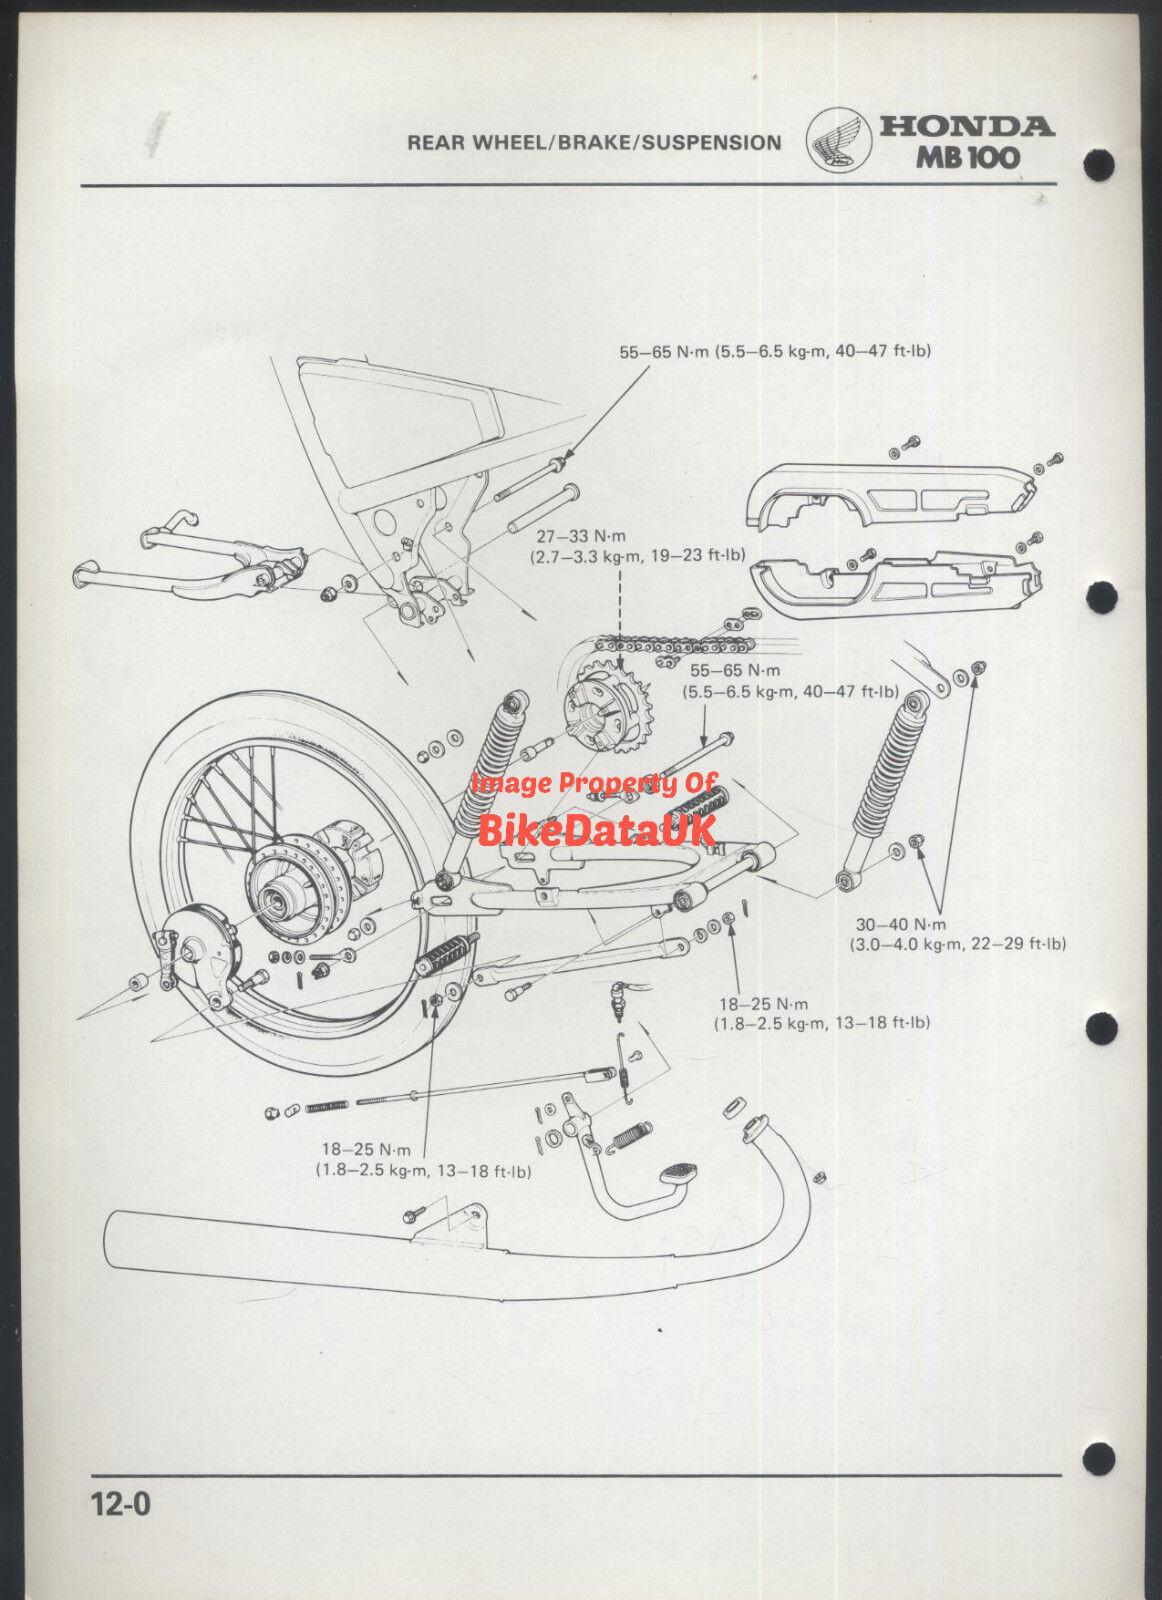 Honda H100a 1980 Official Factory Shop Manual H Mb 100 Ha01 Pre Wiring Diagram H100 H100s Am77 Ebay